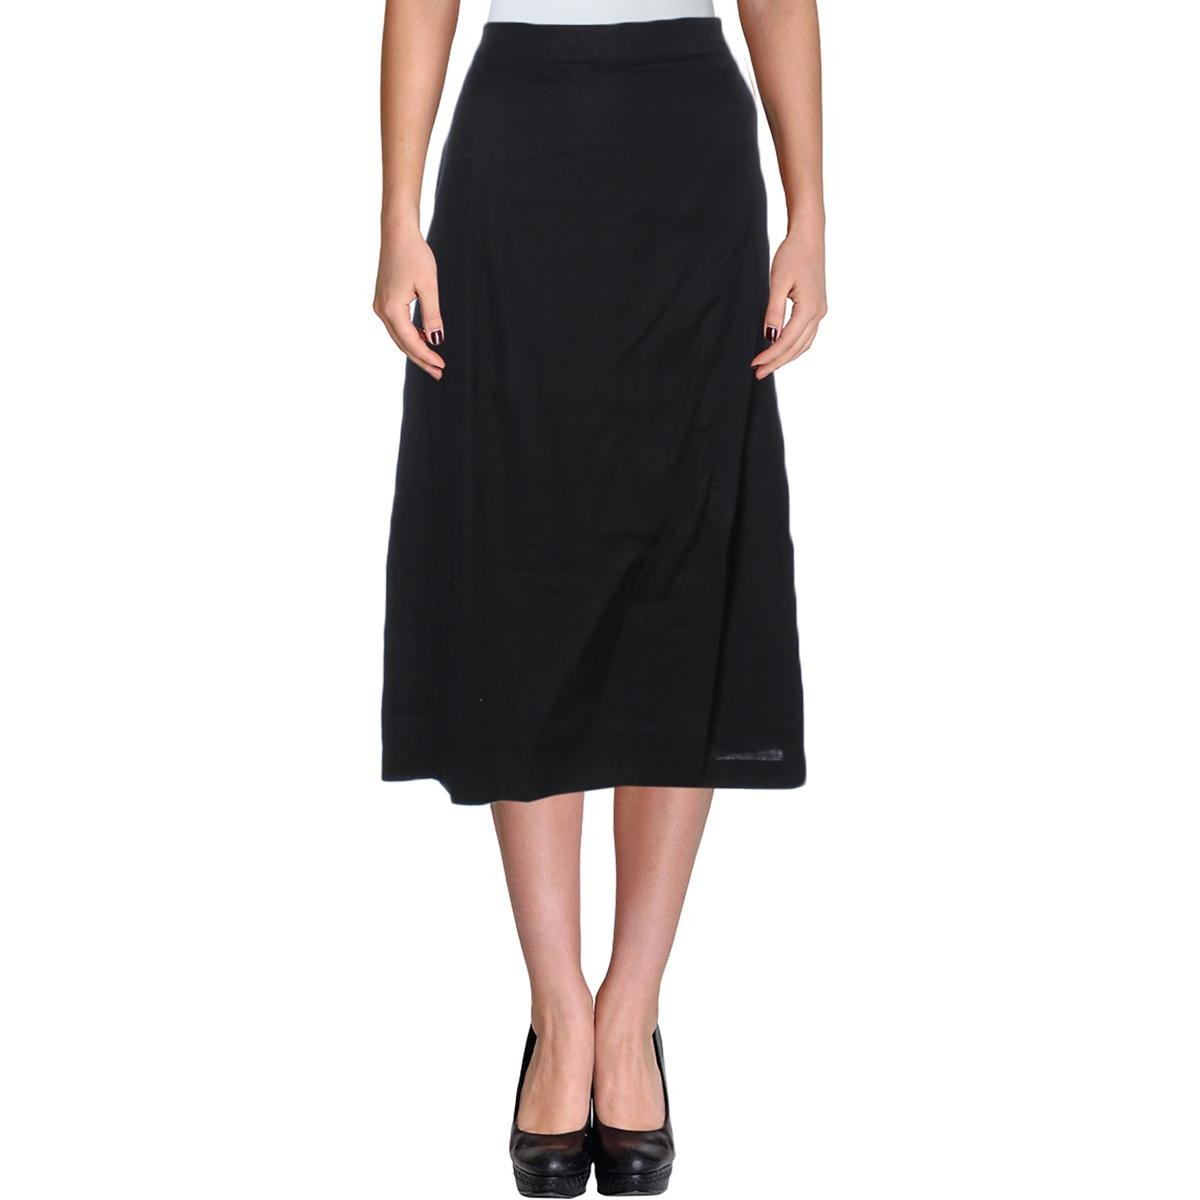 Eileen Fisher Womens Linen Faux-Wrap A-Line Skirt Black M by Eileen Fisher